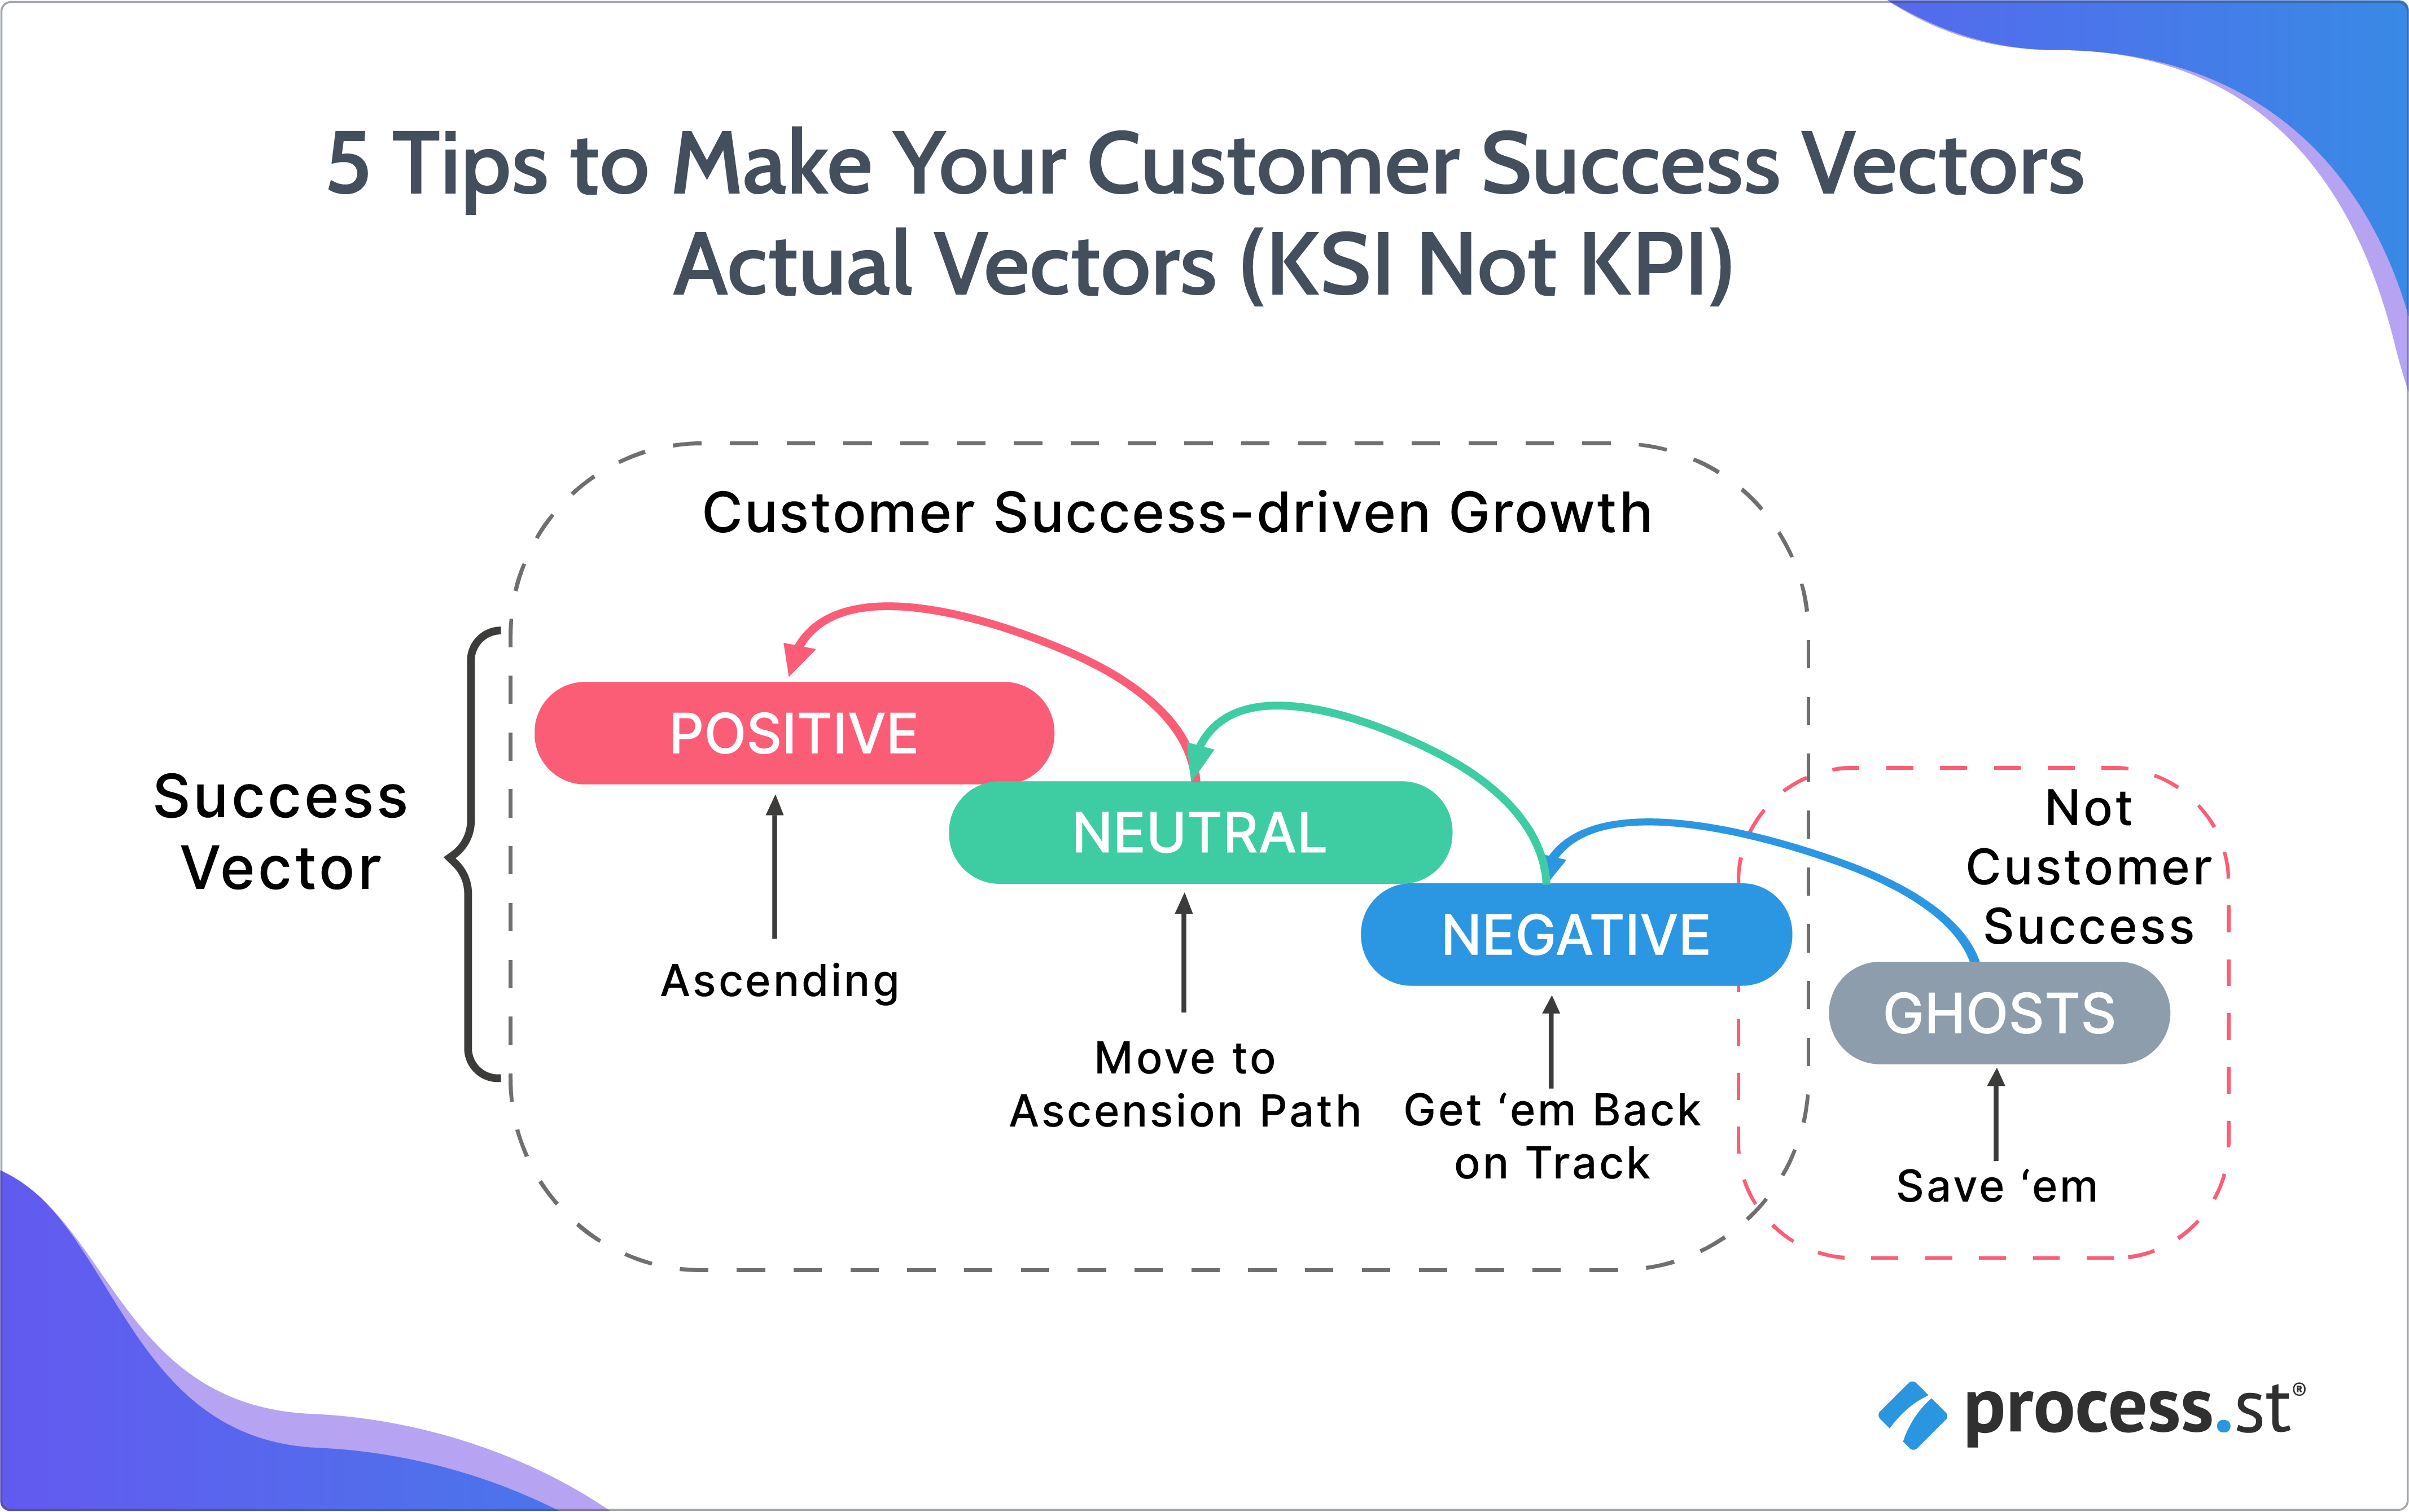 5 Tips to Make Your Customer Success Vectors Actual Vectors (KSI Not KPI)-05